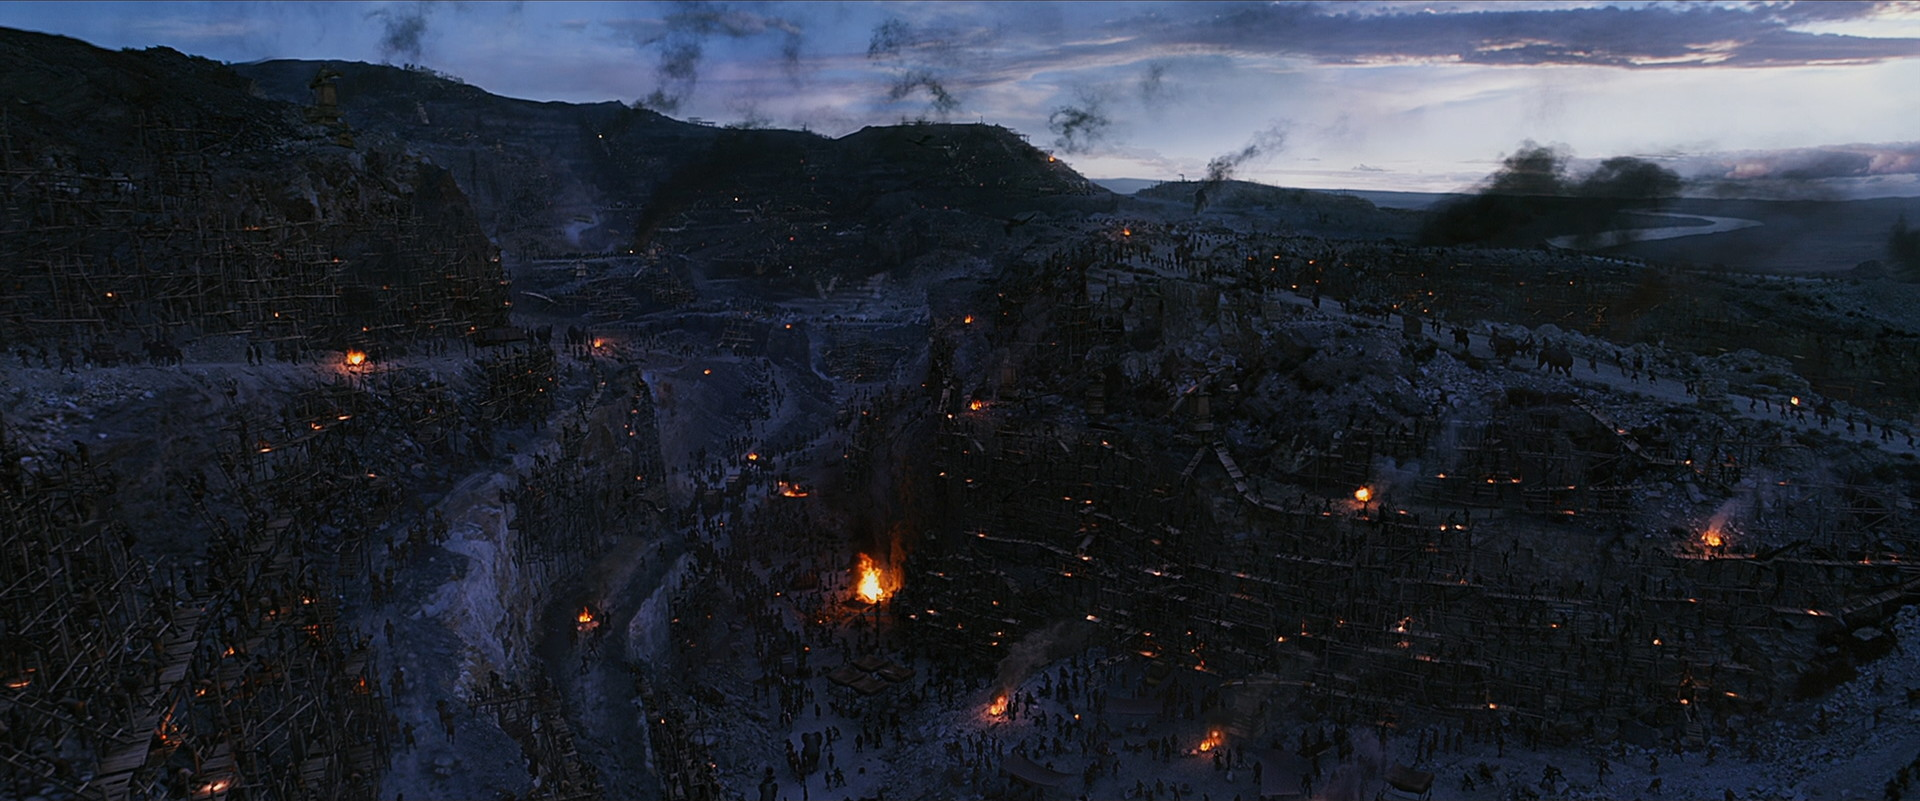 Saby menyhei exodus shot02 16bit